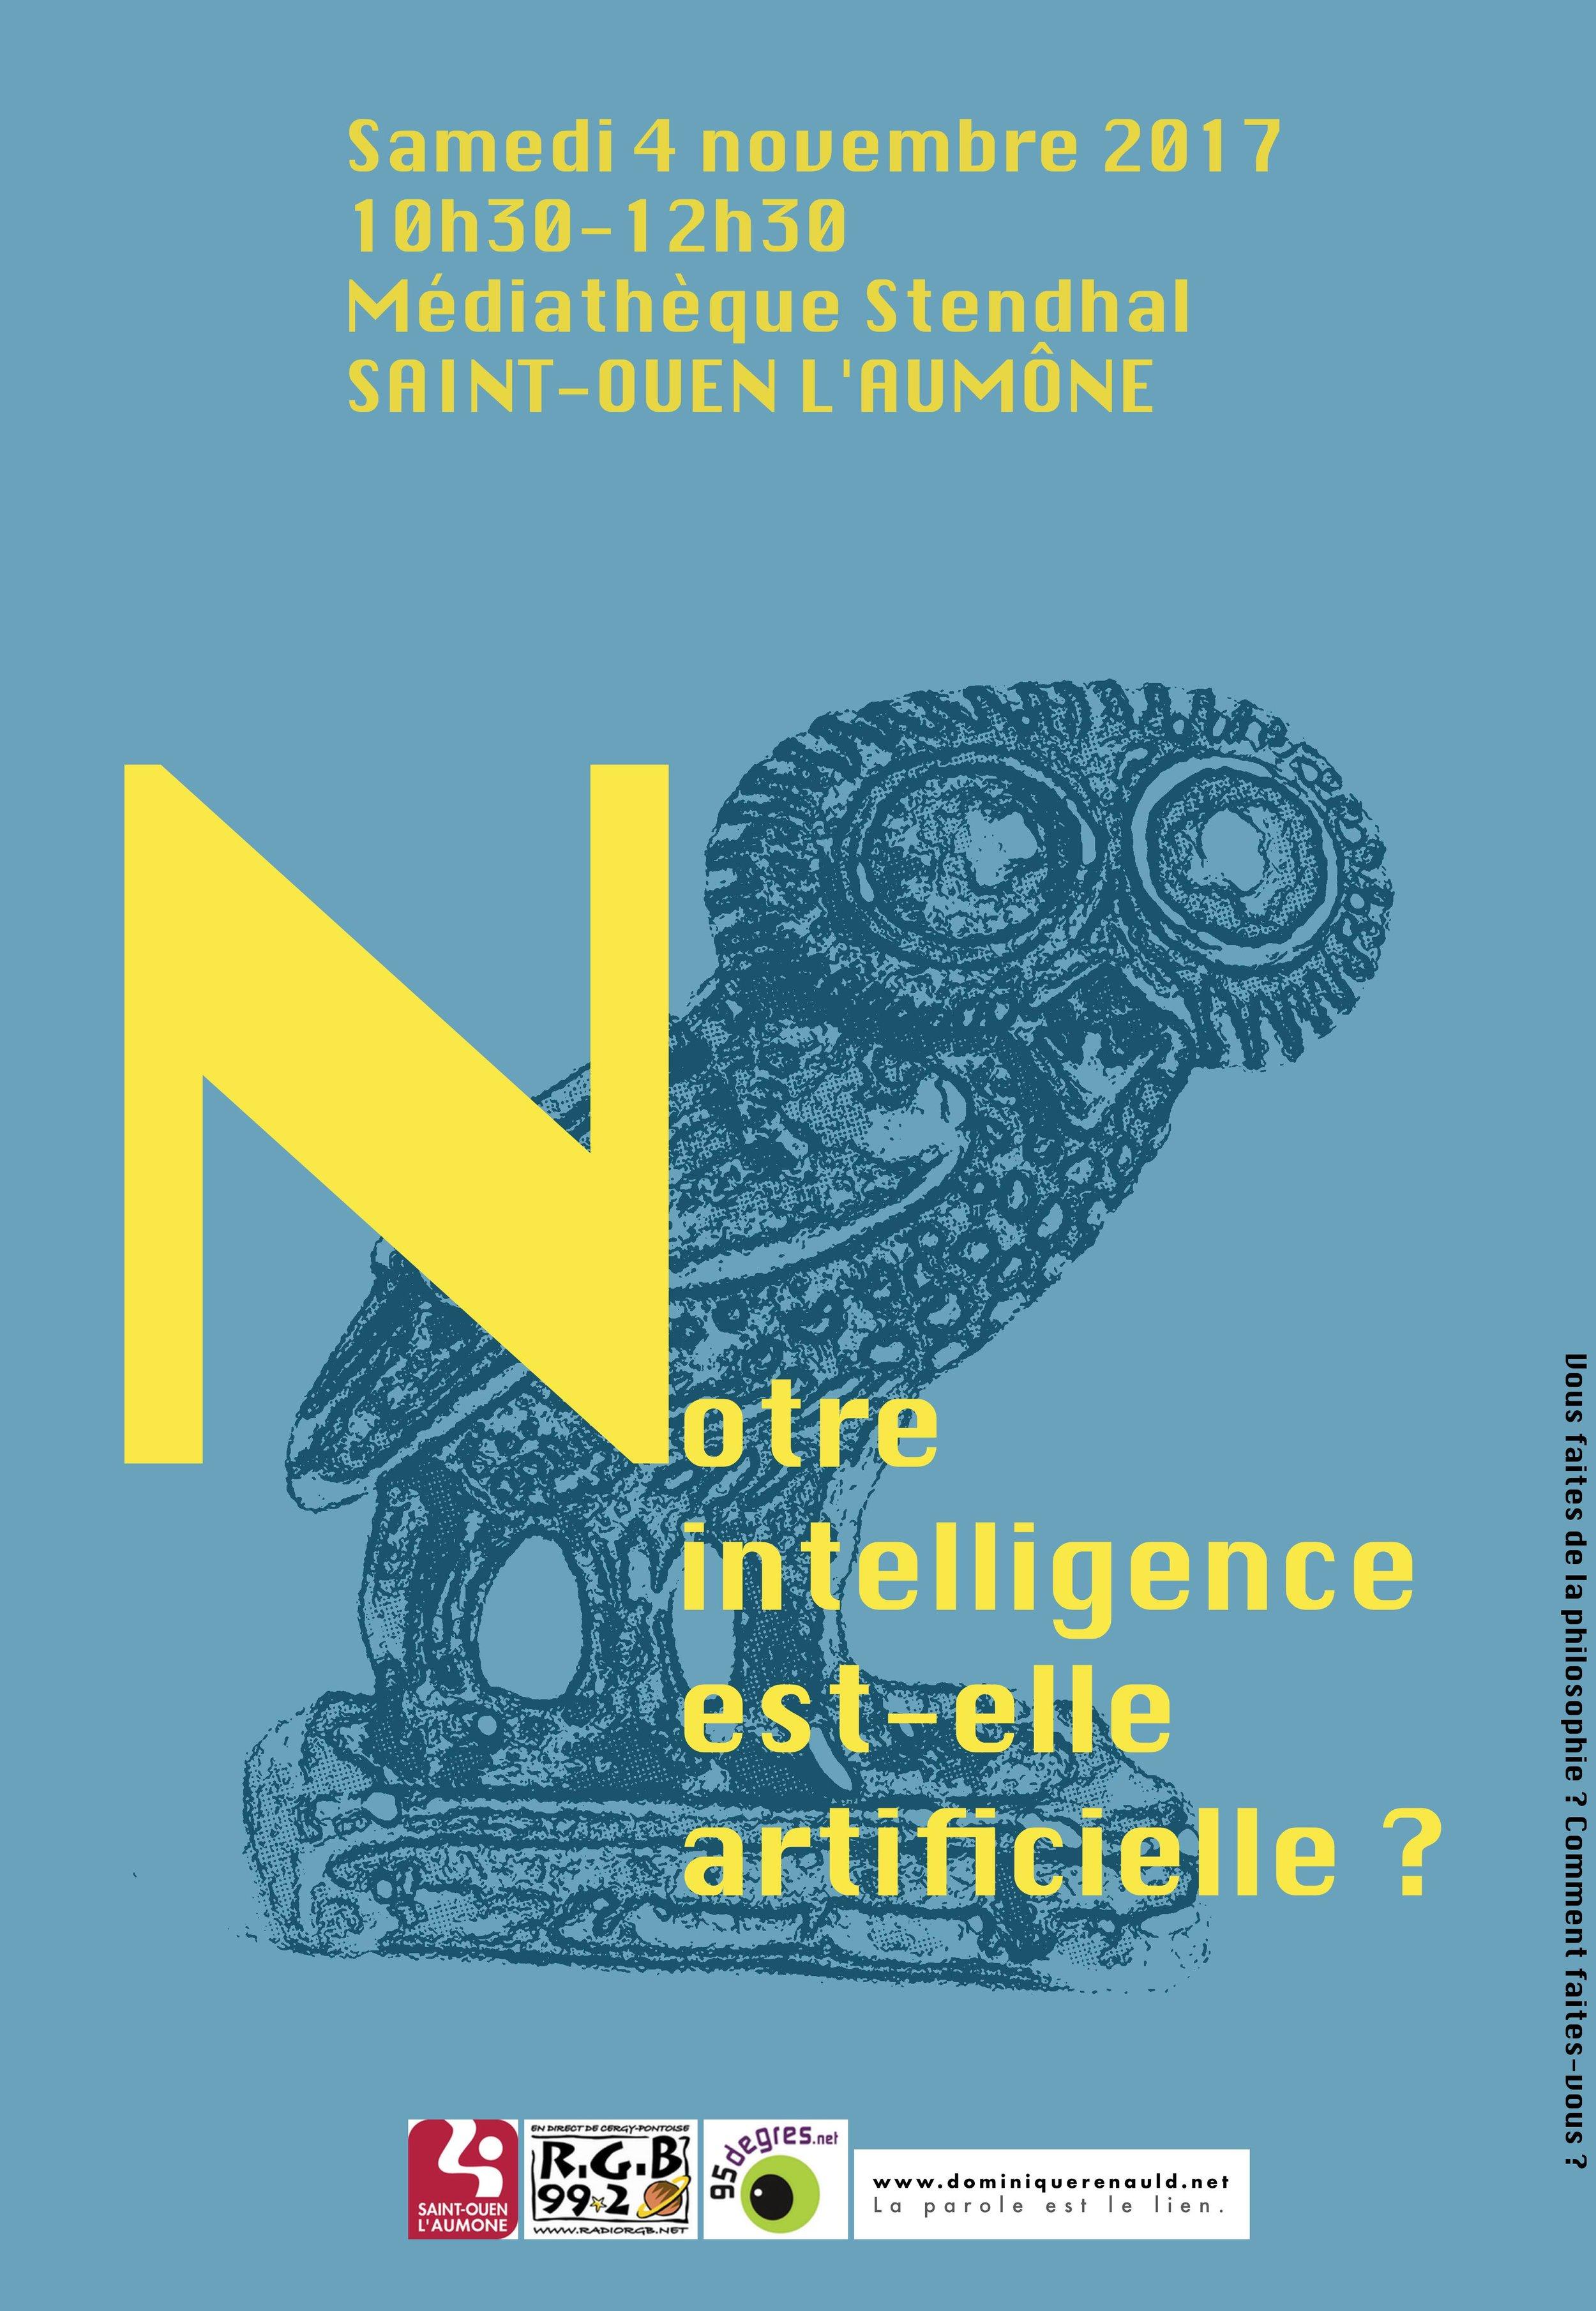 Notre intelligence est-elle artificielle ?.jpg